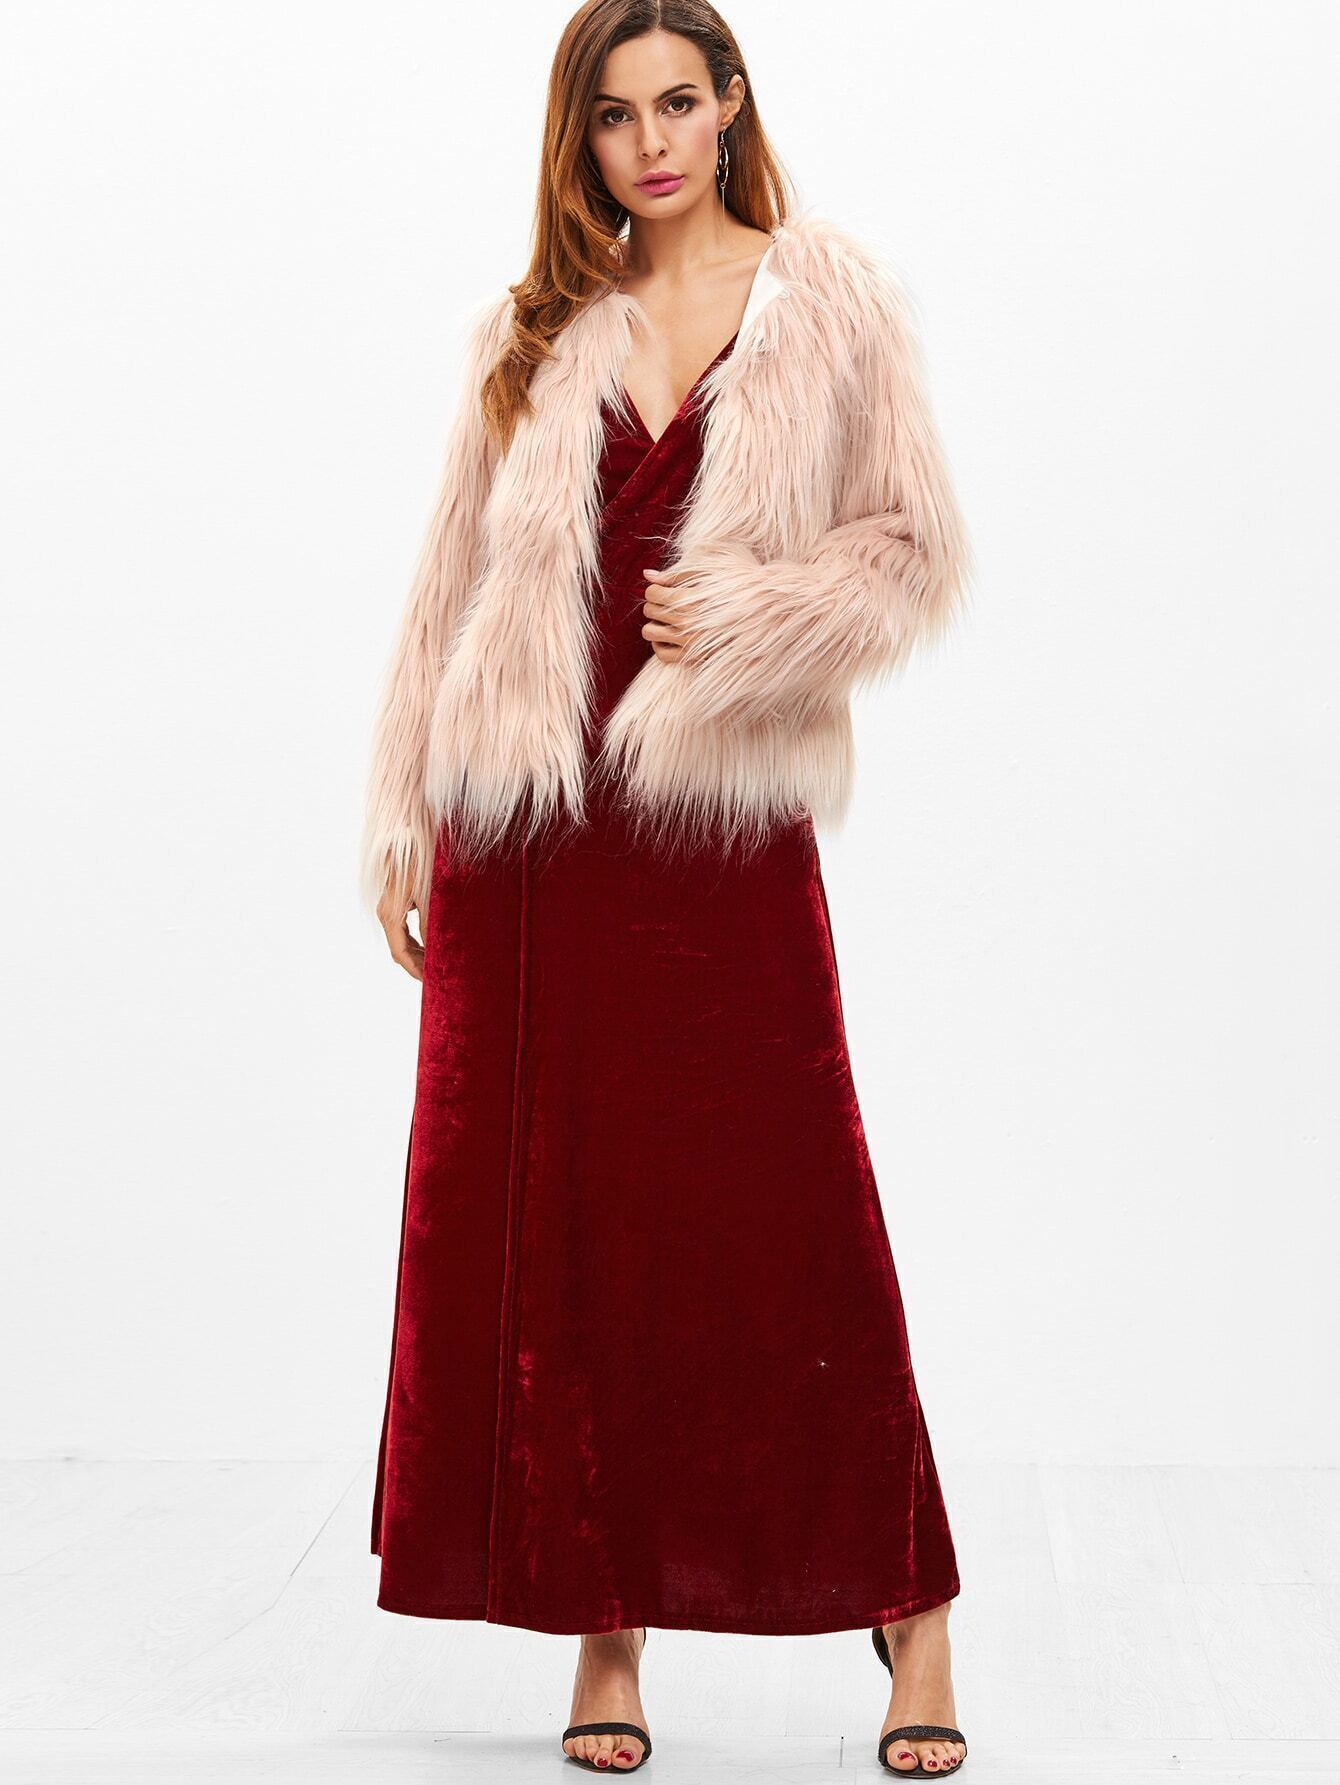 Burgundy Velvet Deep V Neck Backless Wrap Slip Dress EmmaCloth-Women Fast  Fashion Online 6ce9810eb